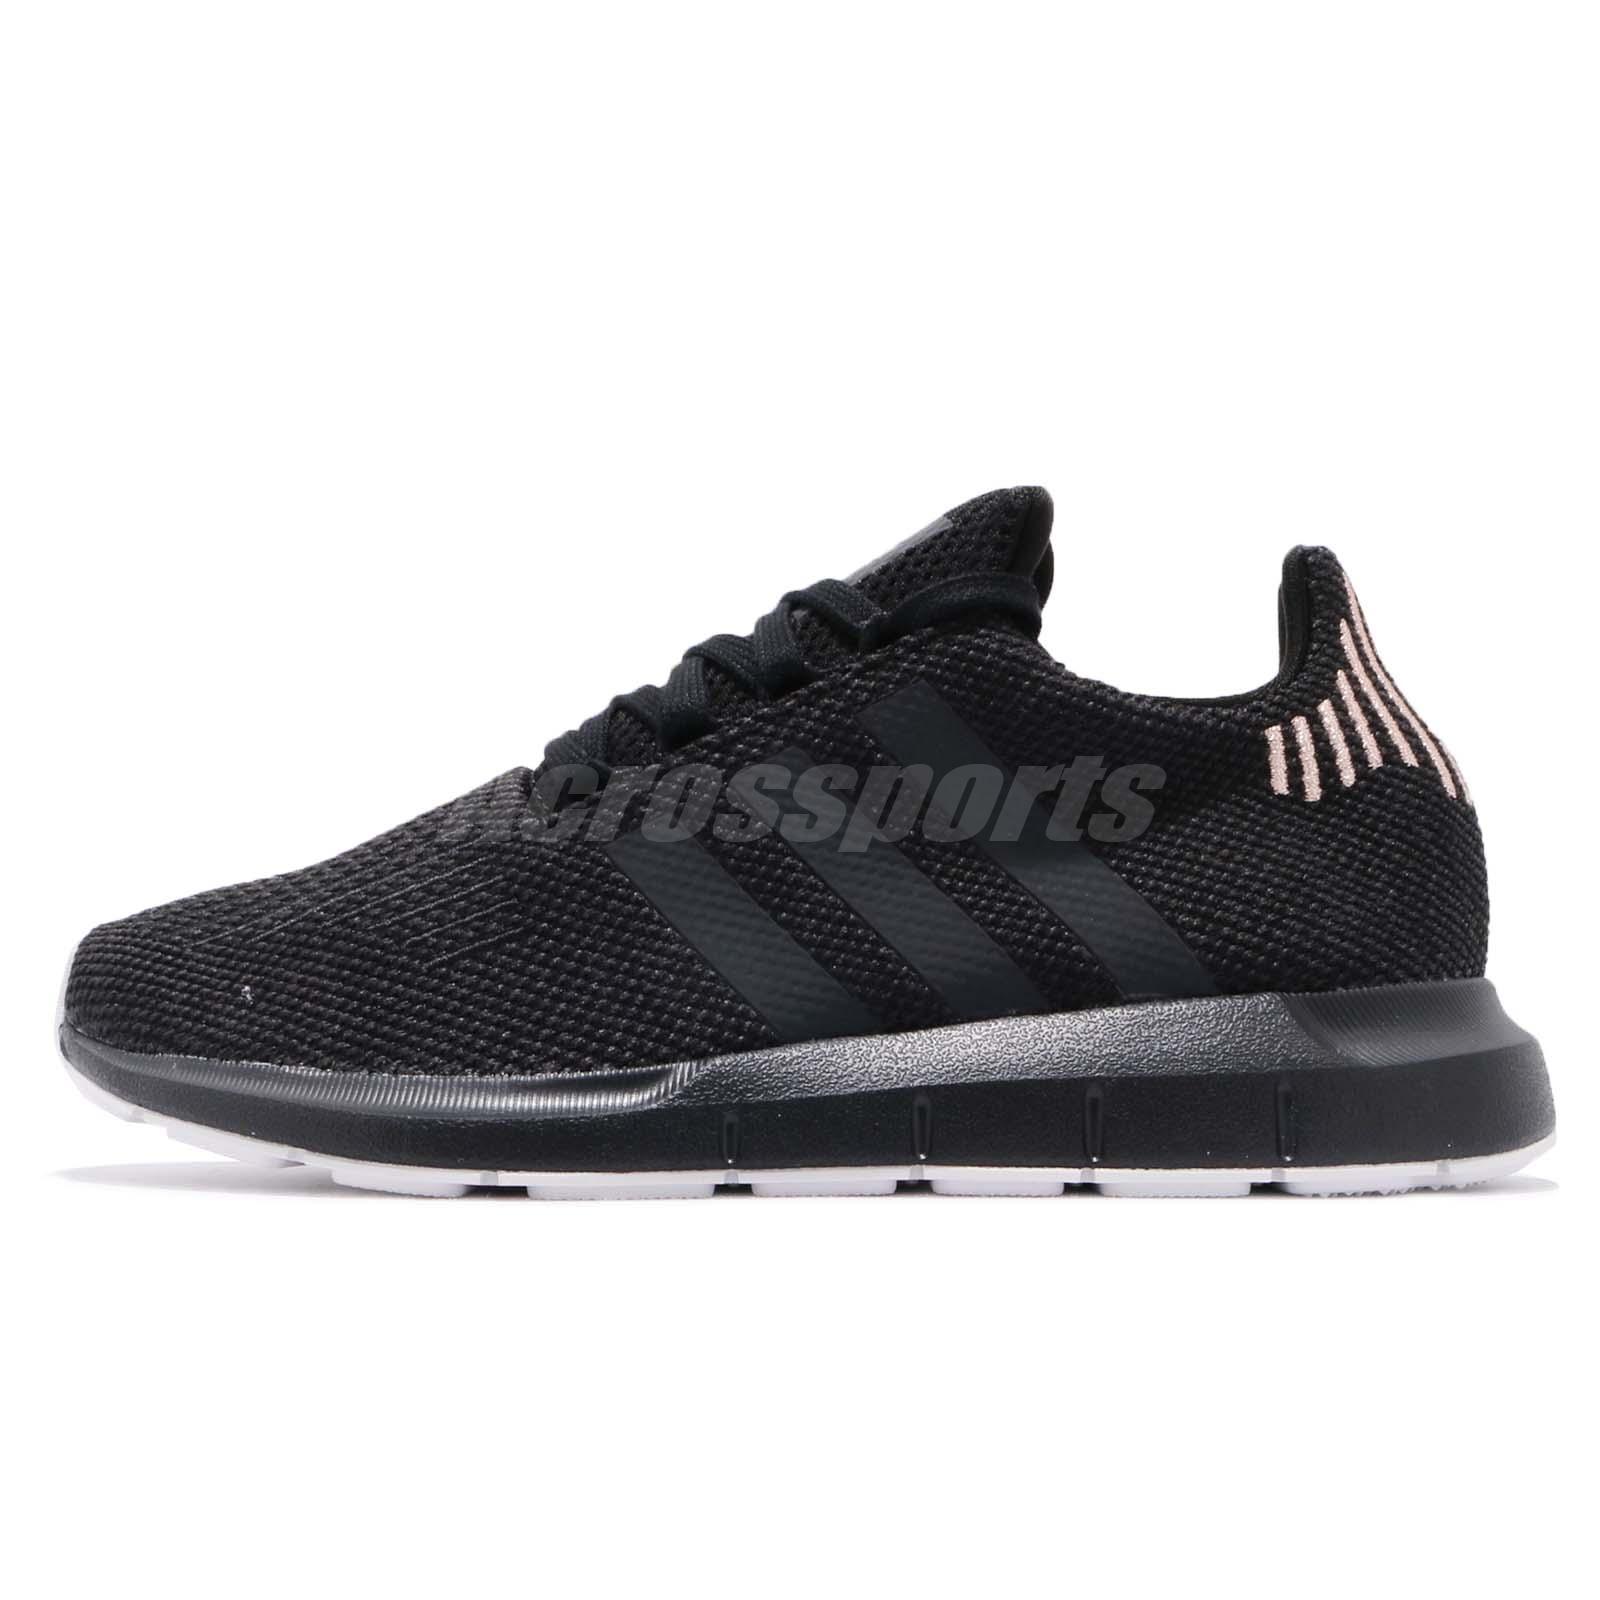 Details about adidas Originals Swift Run W Black Carbon Women Running Shoes Sneakers B37723